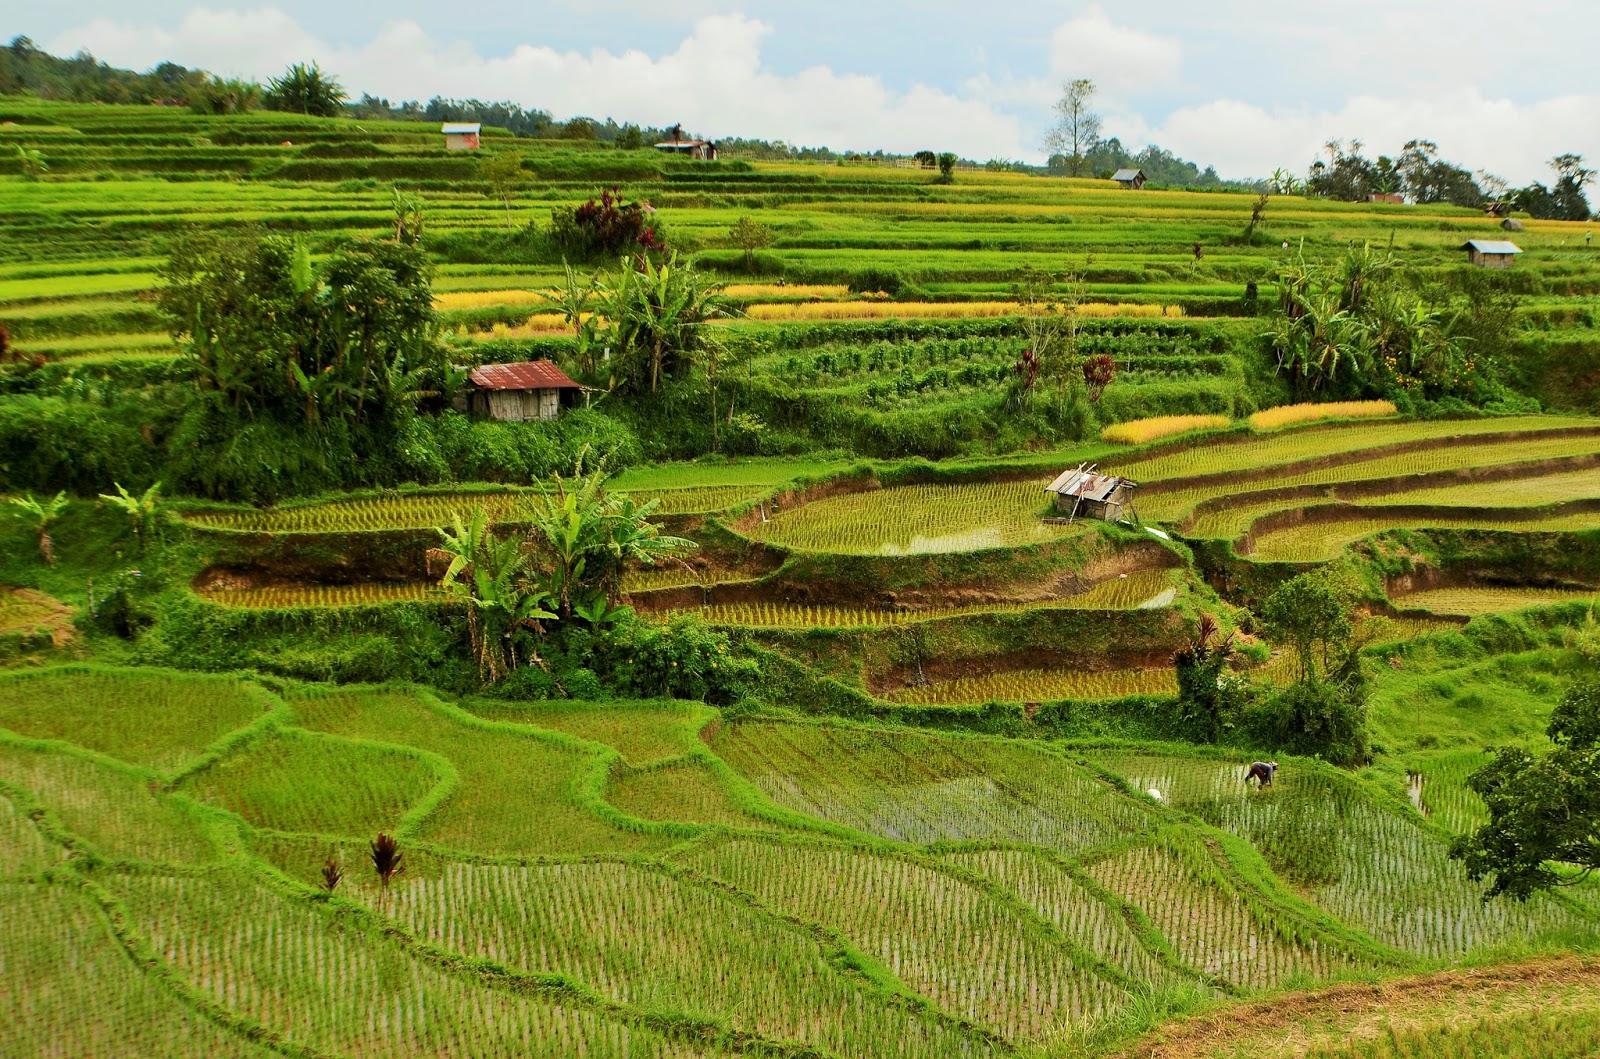 Pariangan Rice Terrace in West Sumatra